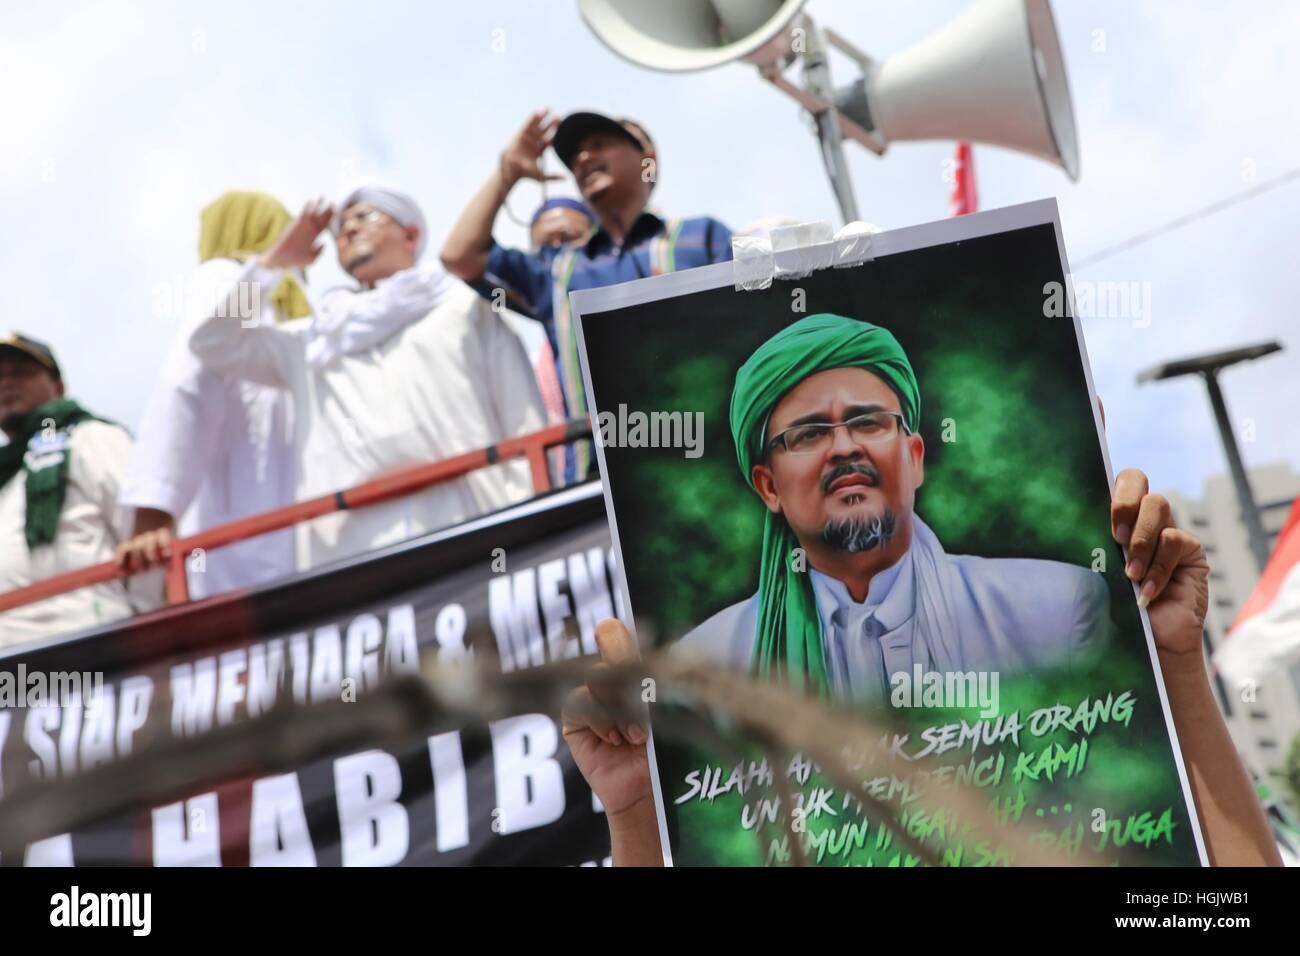 Jakarta Indonesia 23rd Jan 2017 Habib Rizieq Shihab Meets The Stock Photo Alamy